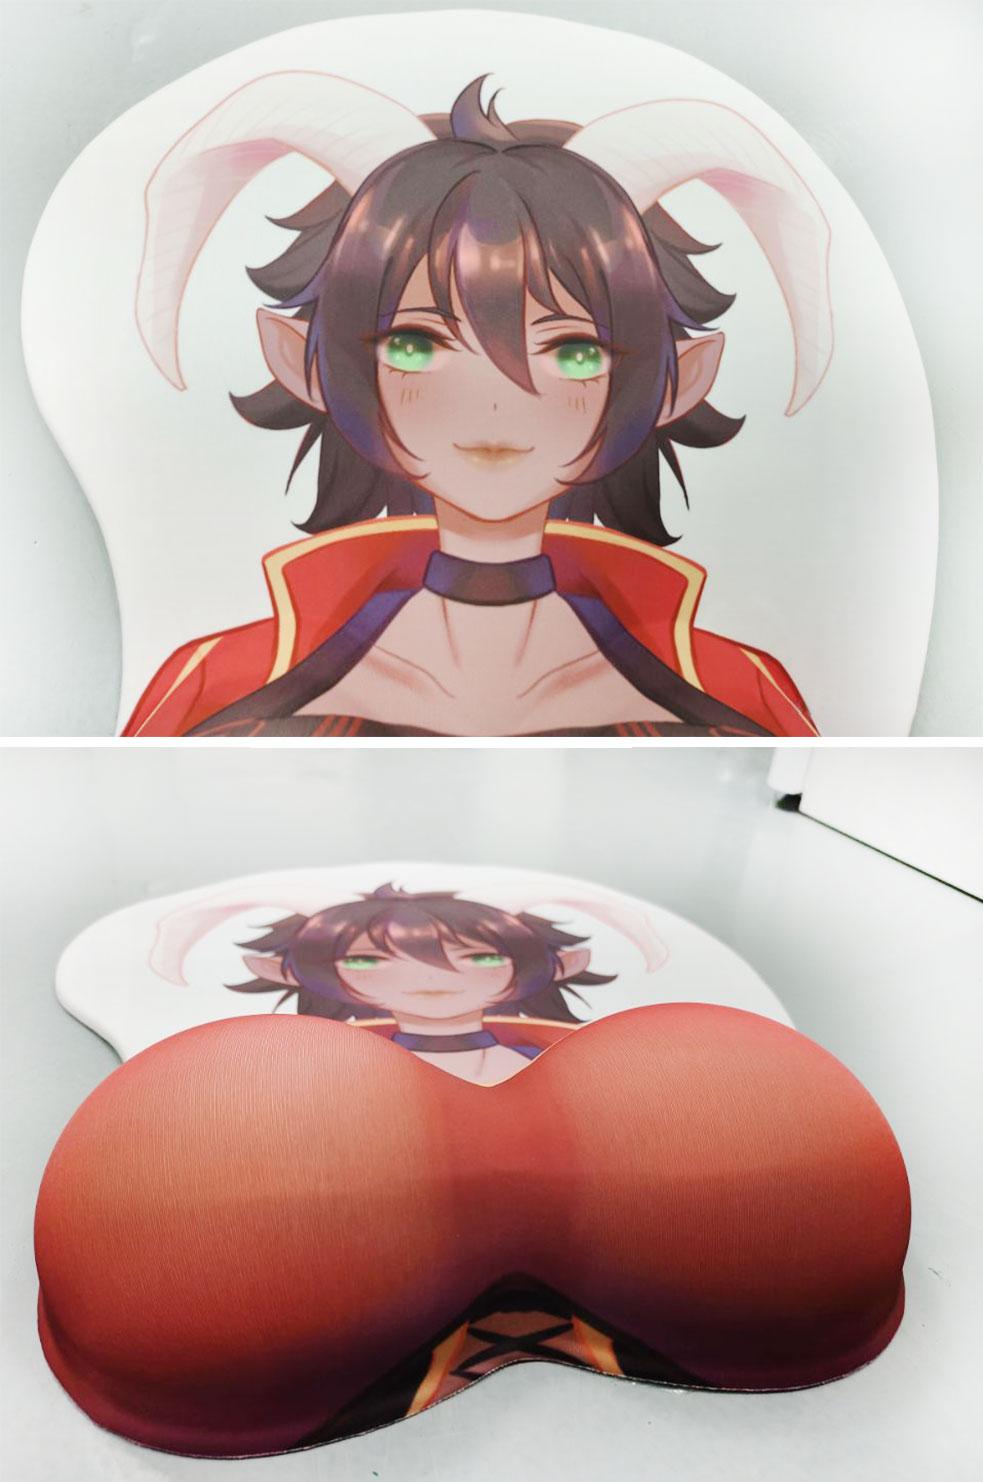 keqing life size oppai mousepad 4921 - Anime Mousepads